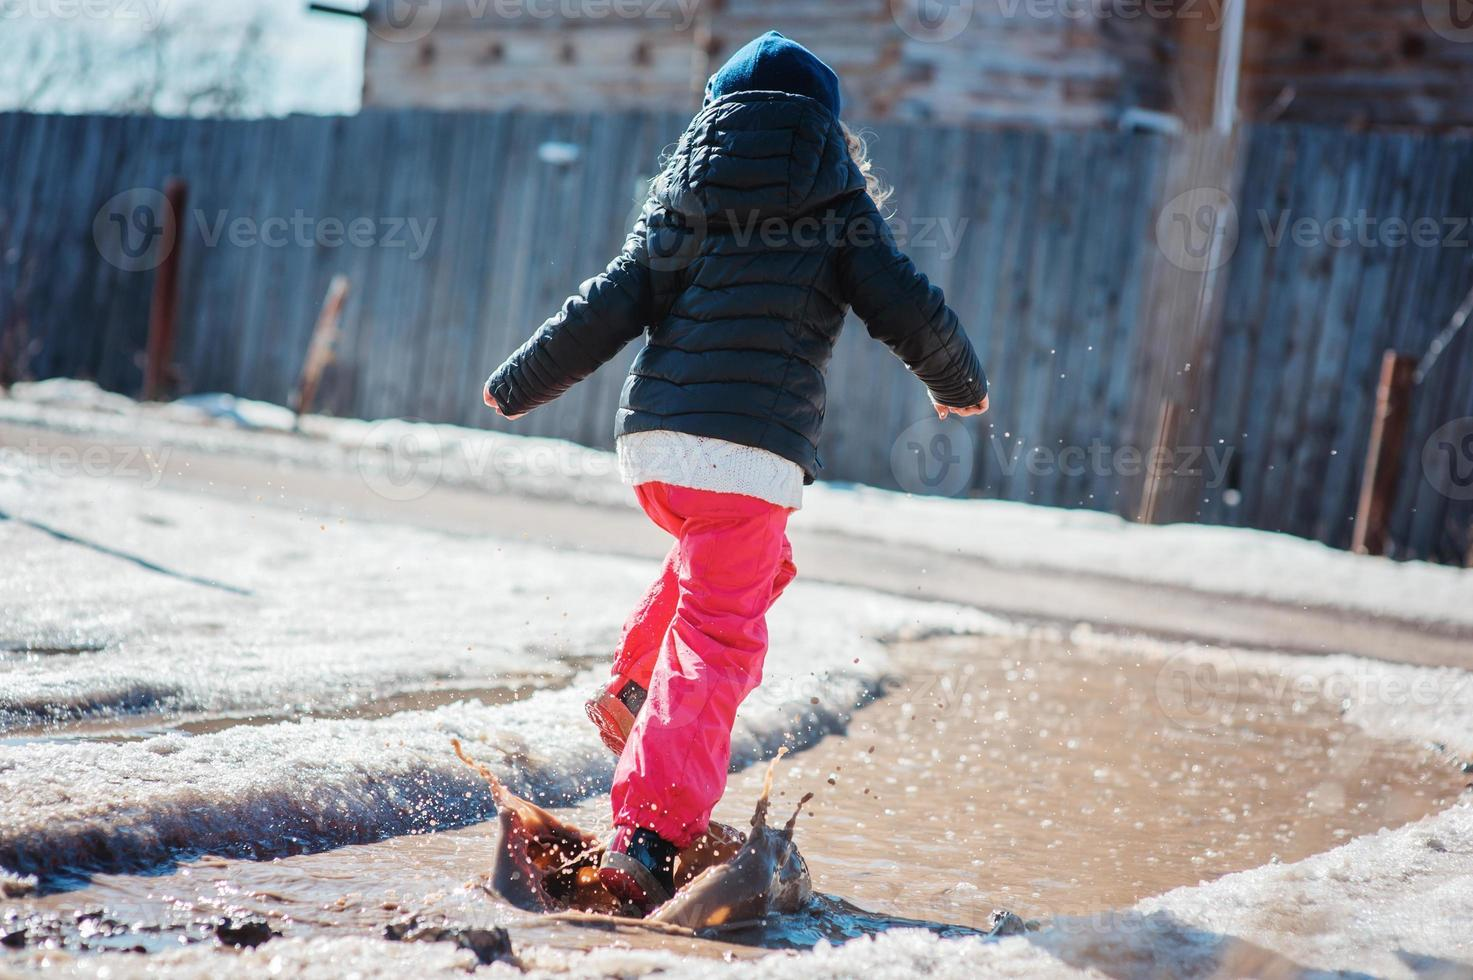 niño niña juega charco saltando en caminata de primavera, actividades al aire libre foto